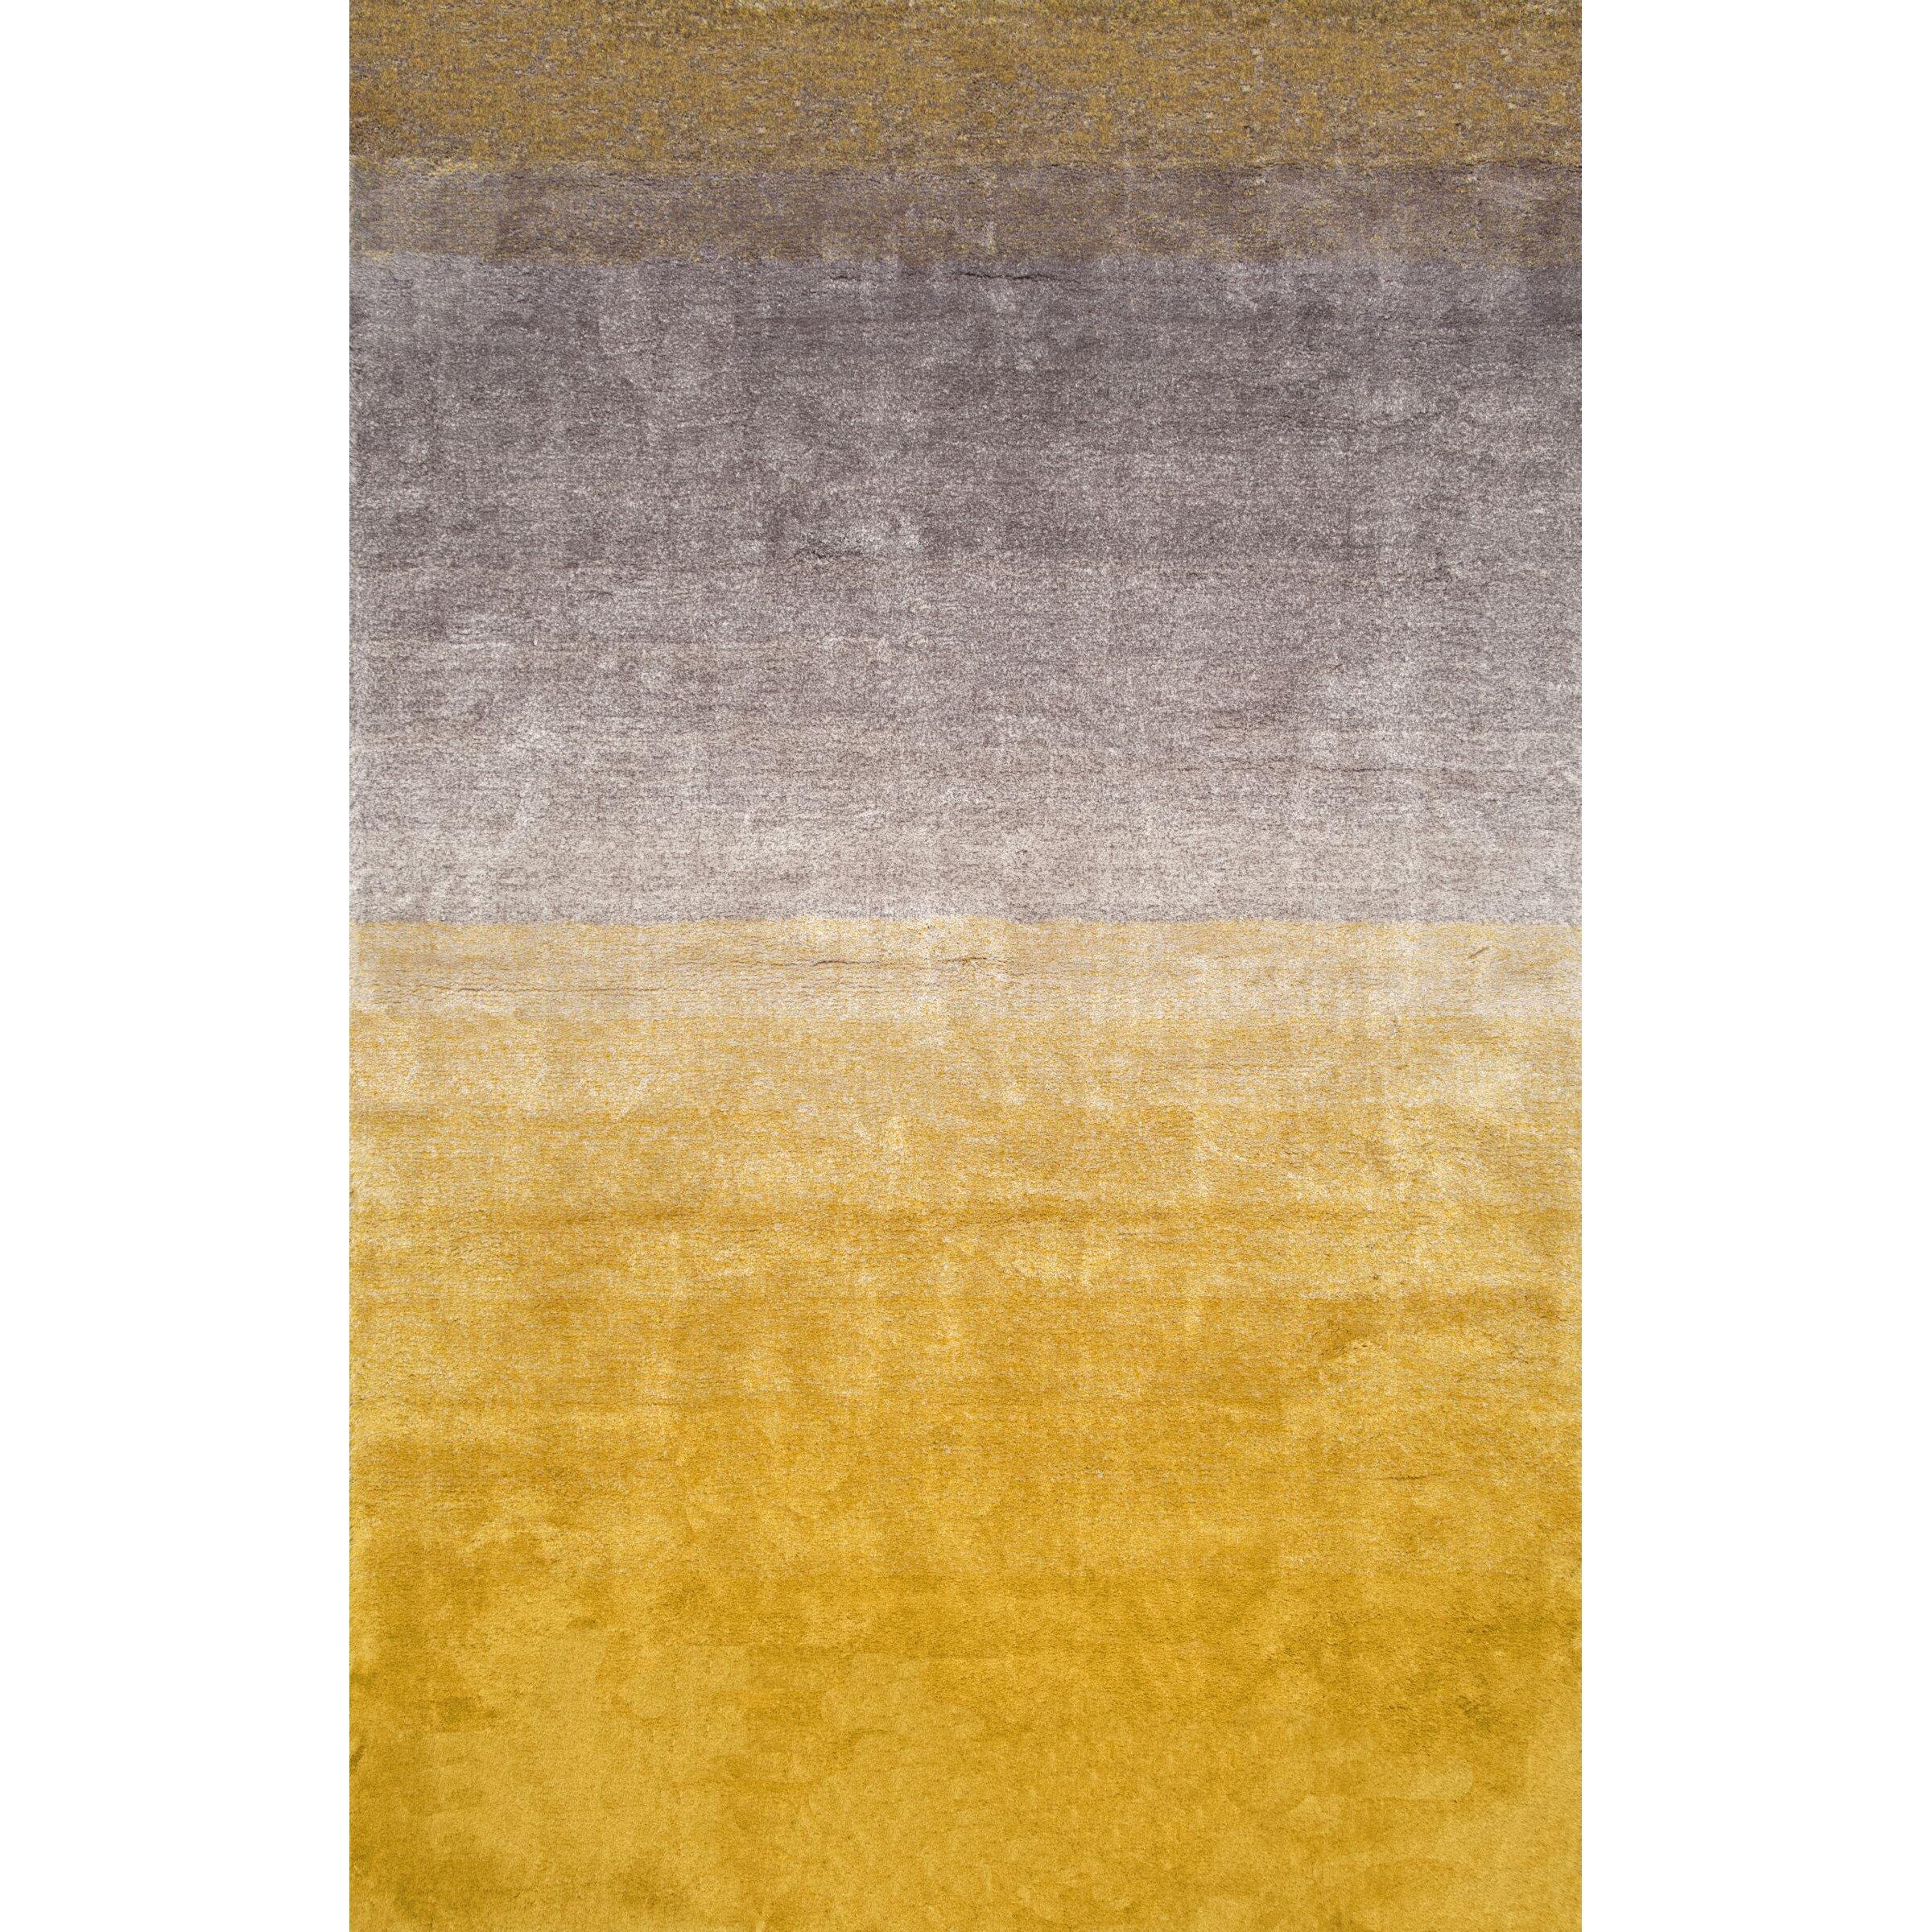 Design Yellow Area Rug yellow area rug roselawnlutheran mercury rowu0026reg bier sion rug